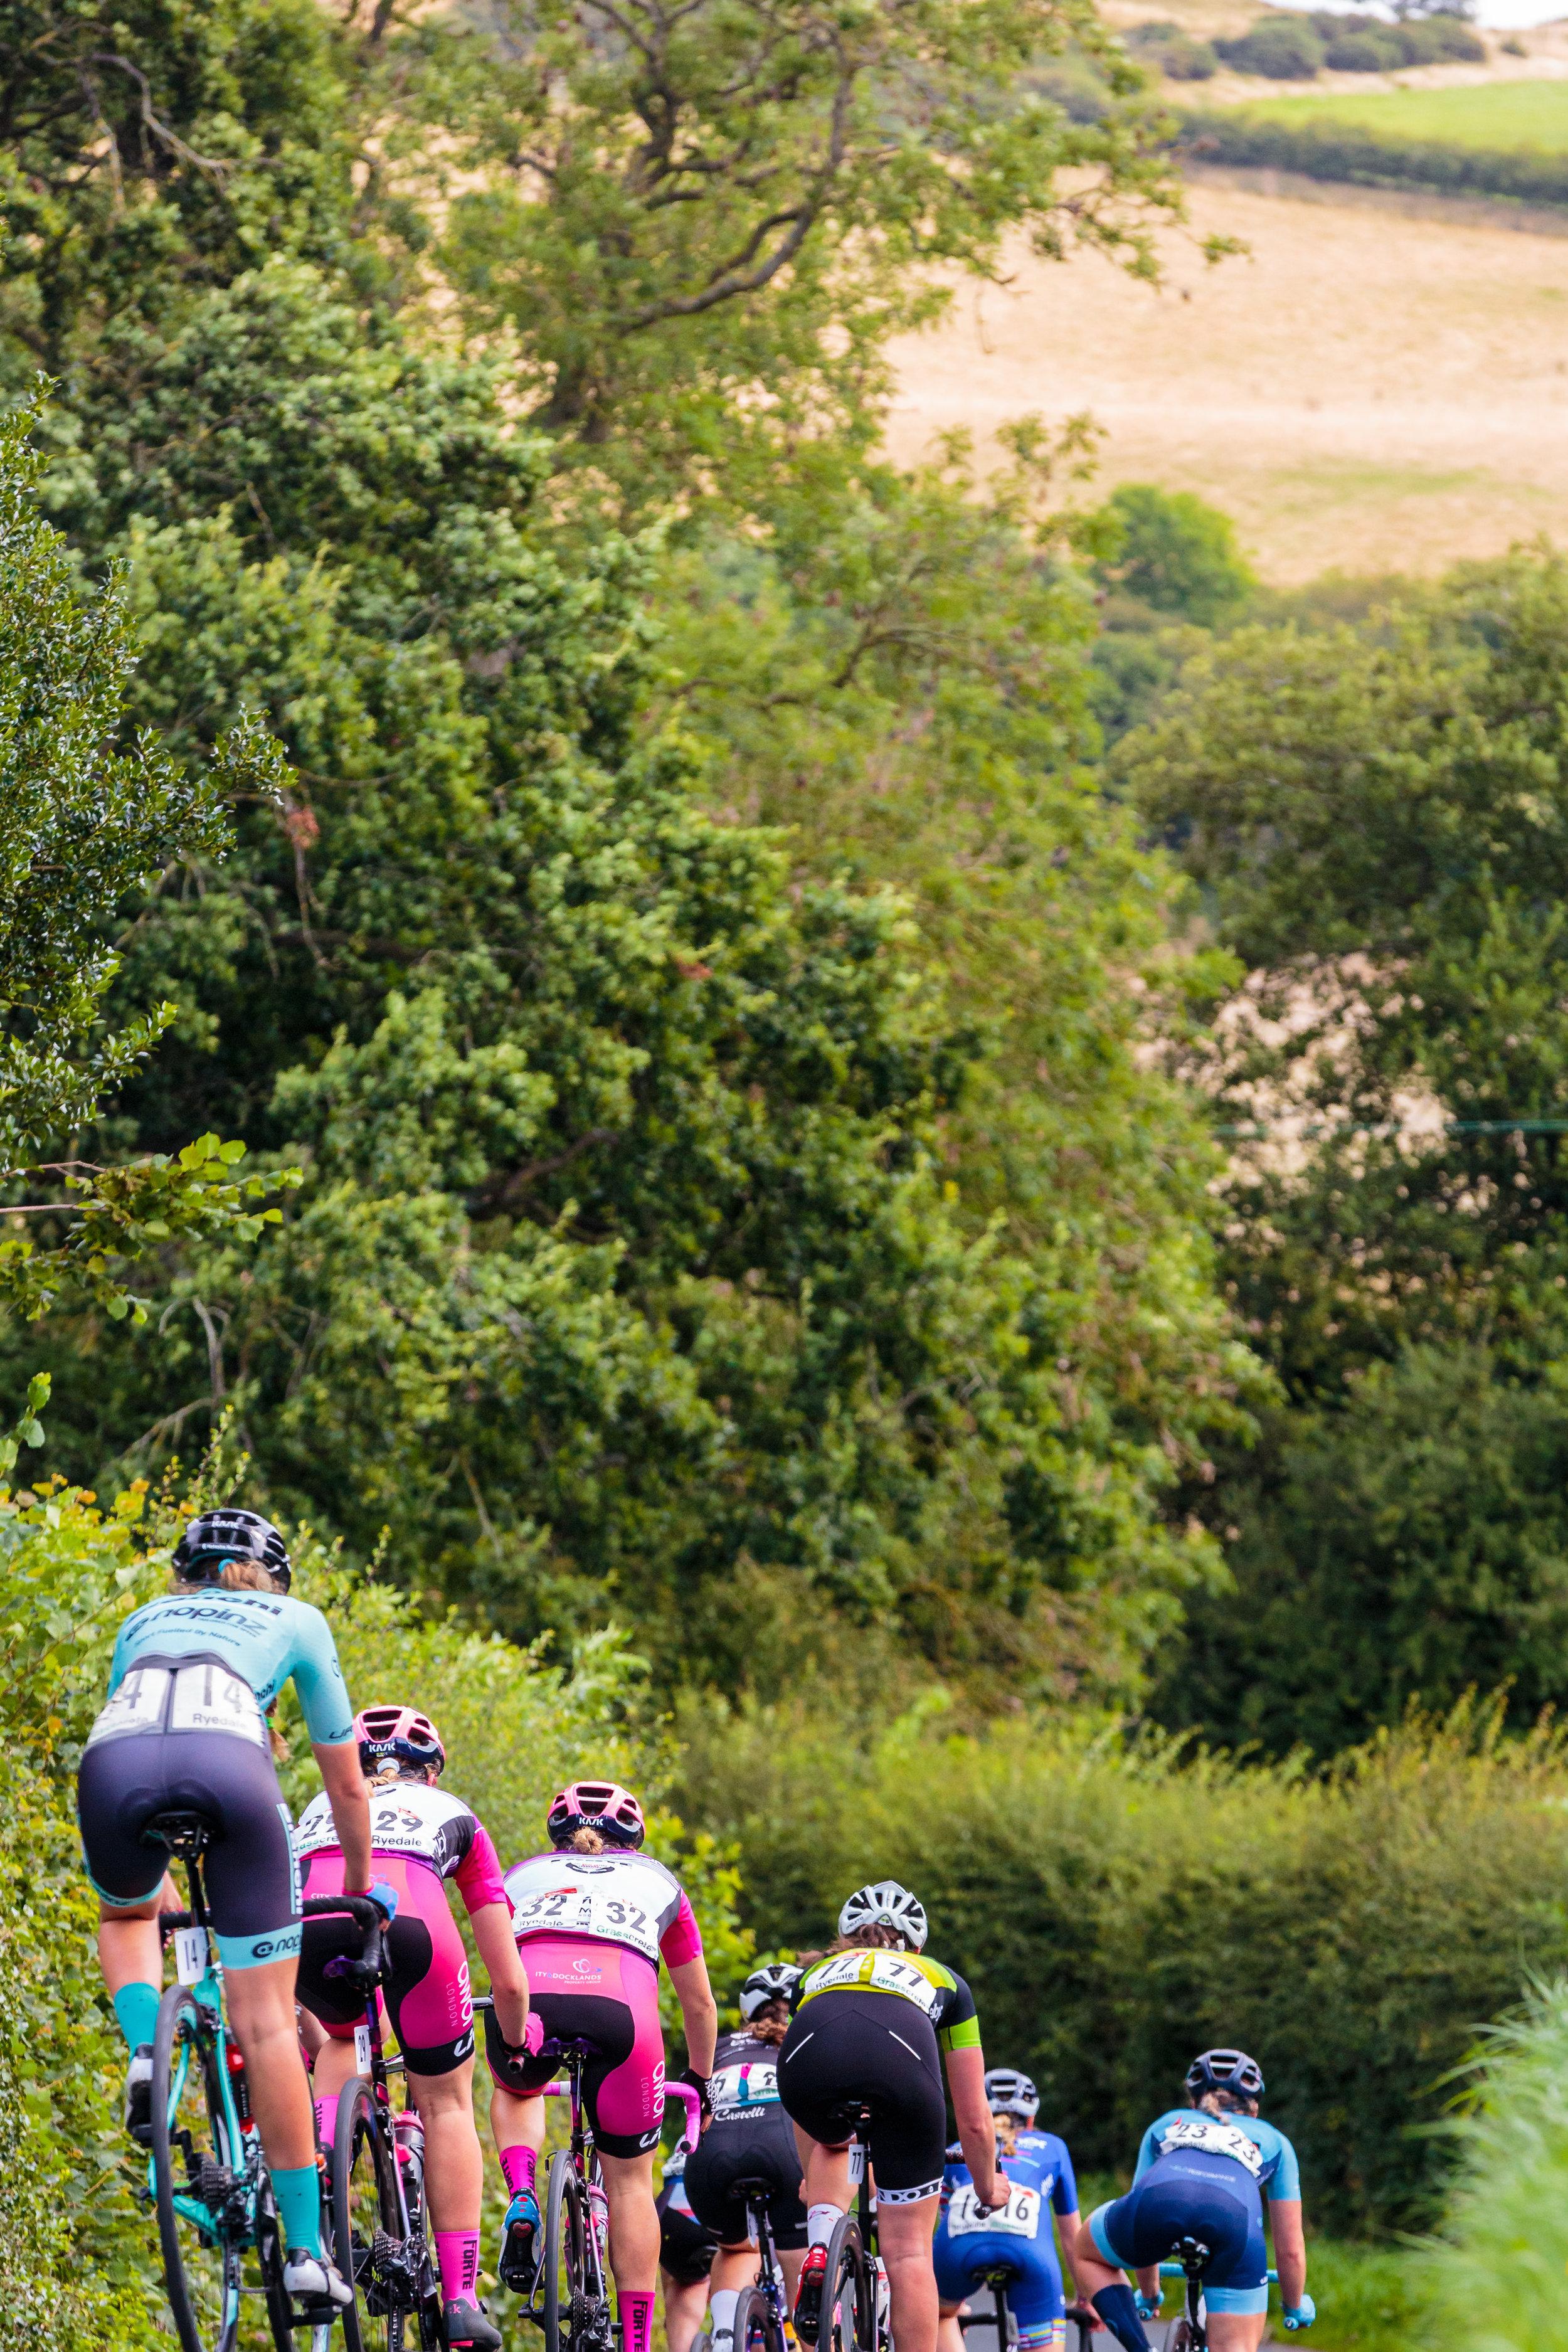 Women Cyclists Descending